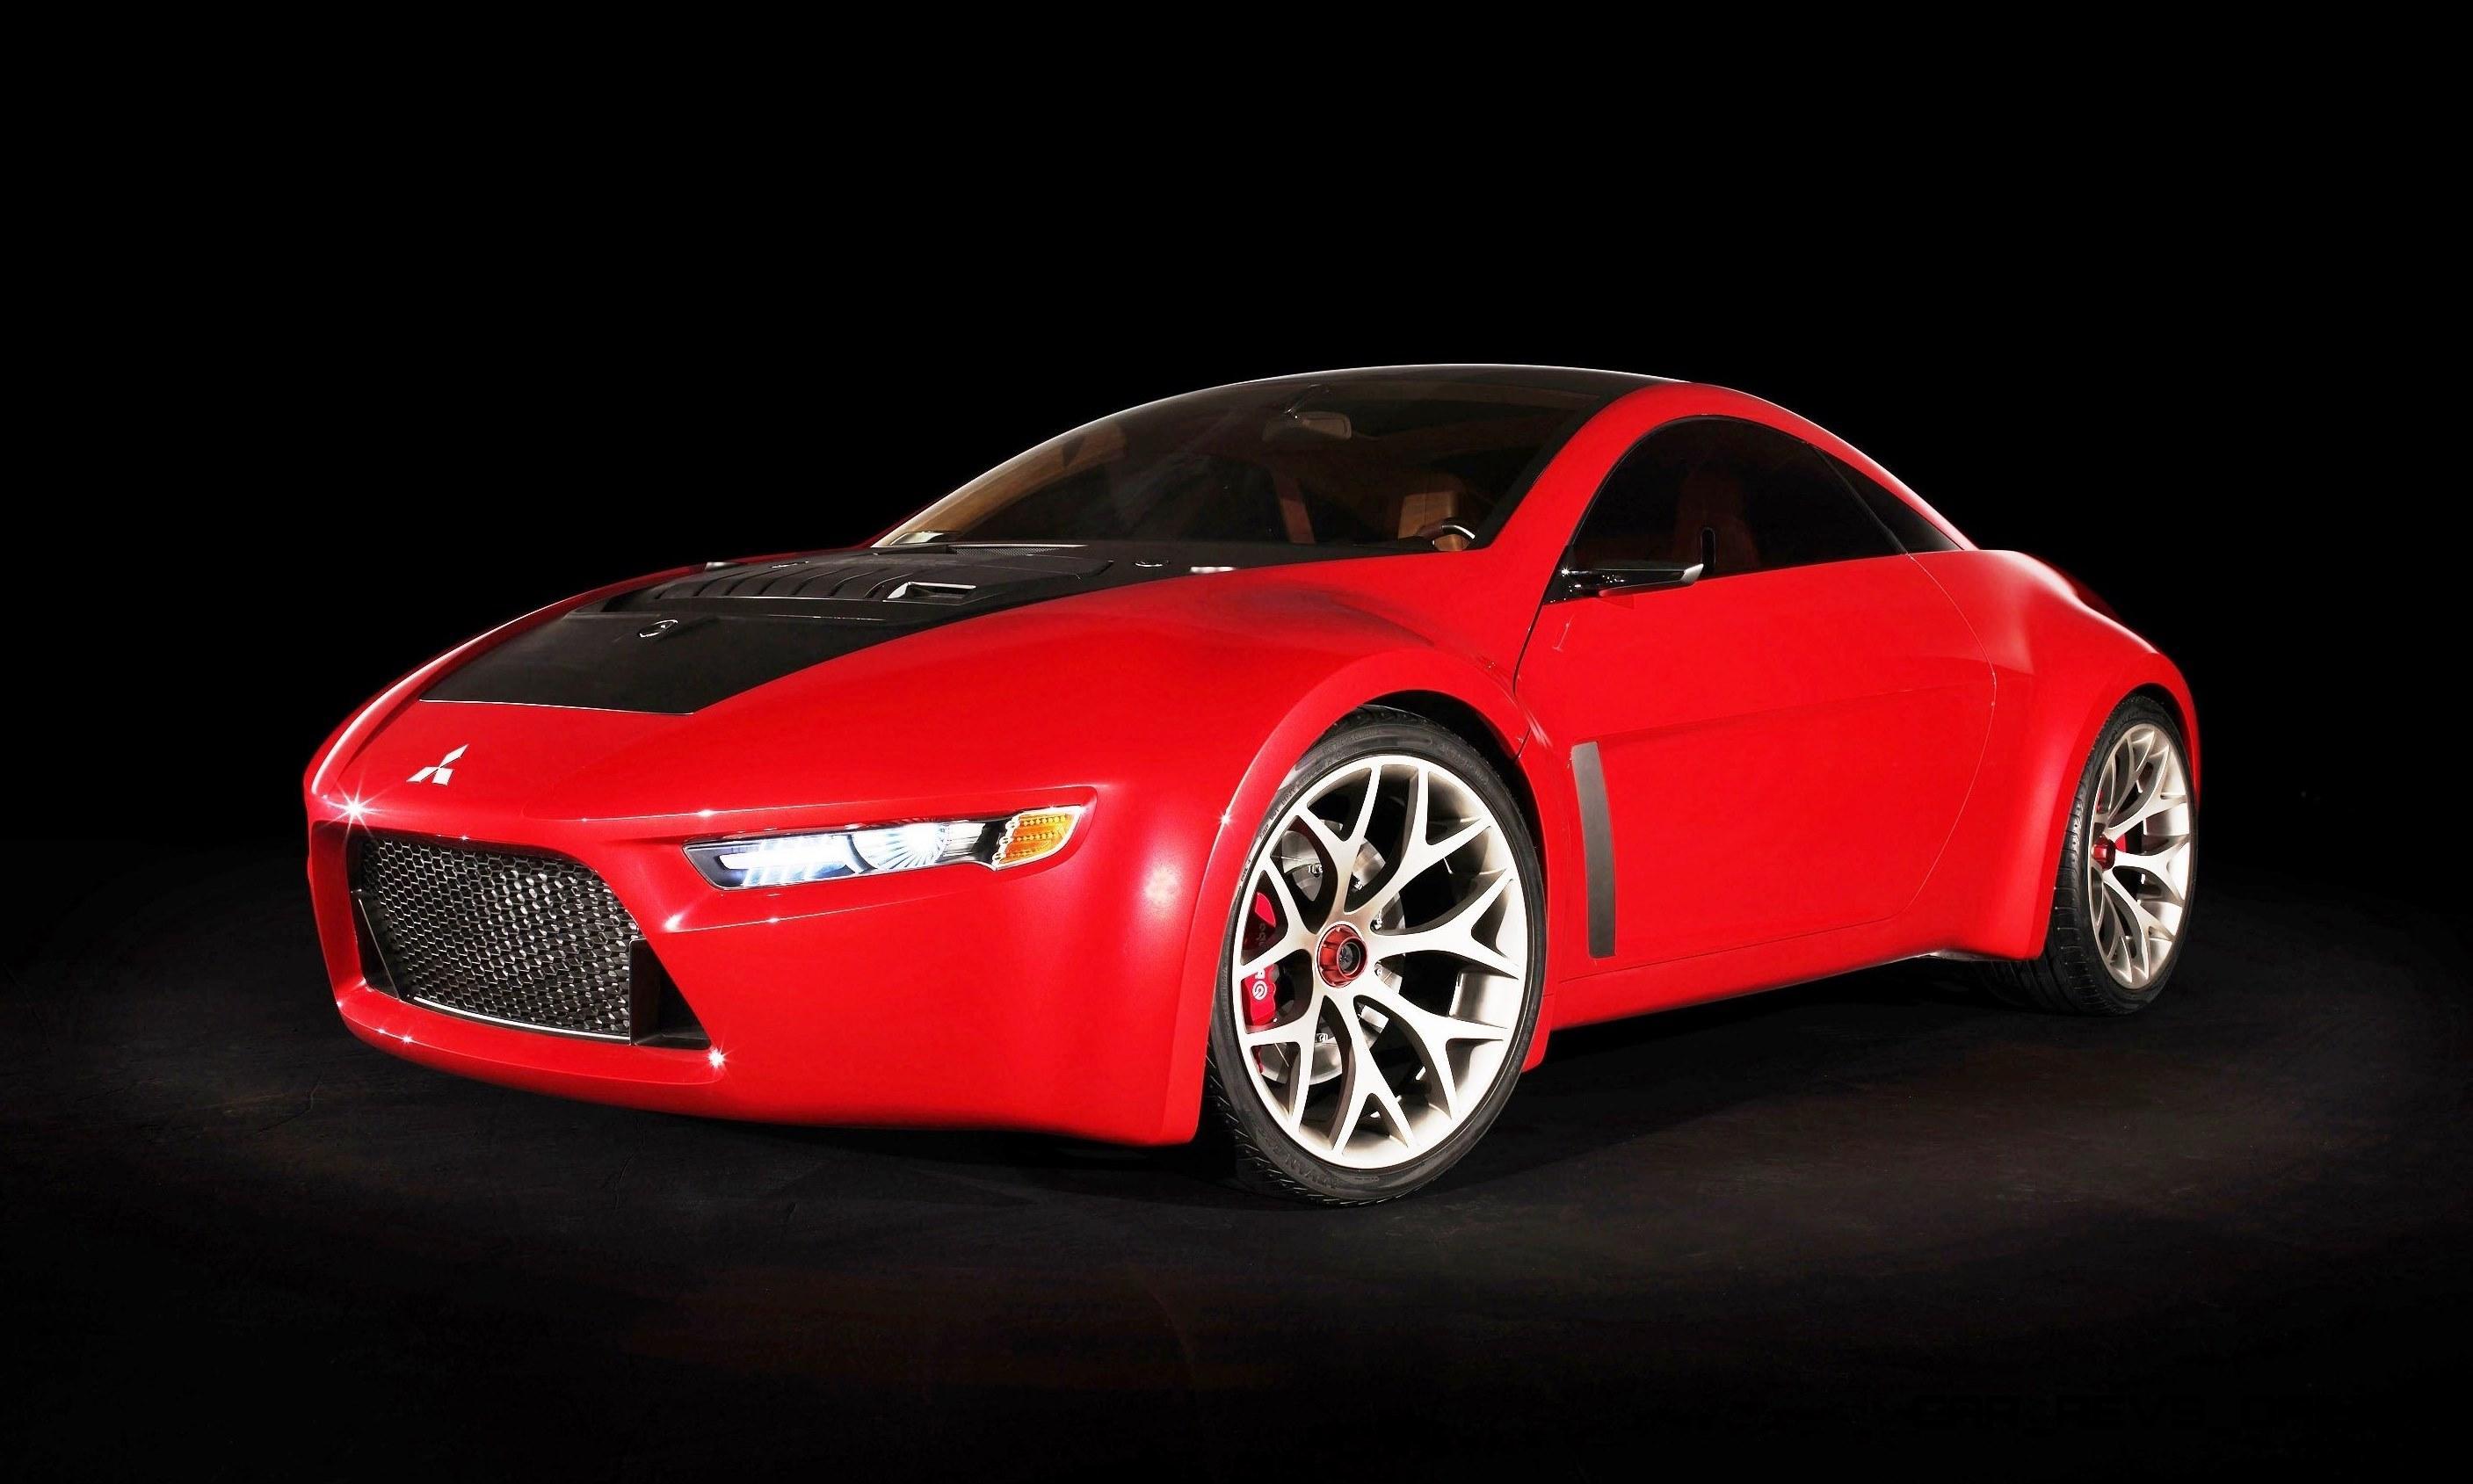 2008 Mitsubishi Concept RA Previewed a 5th-Gen Eclipse GSR ... | 2814 x 1689 jpeg 237kB